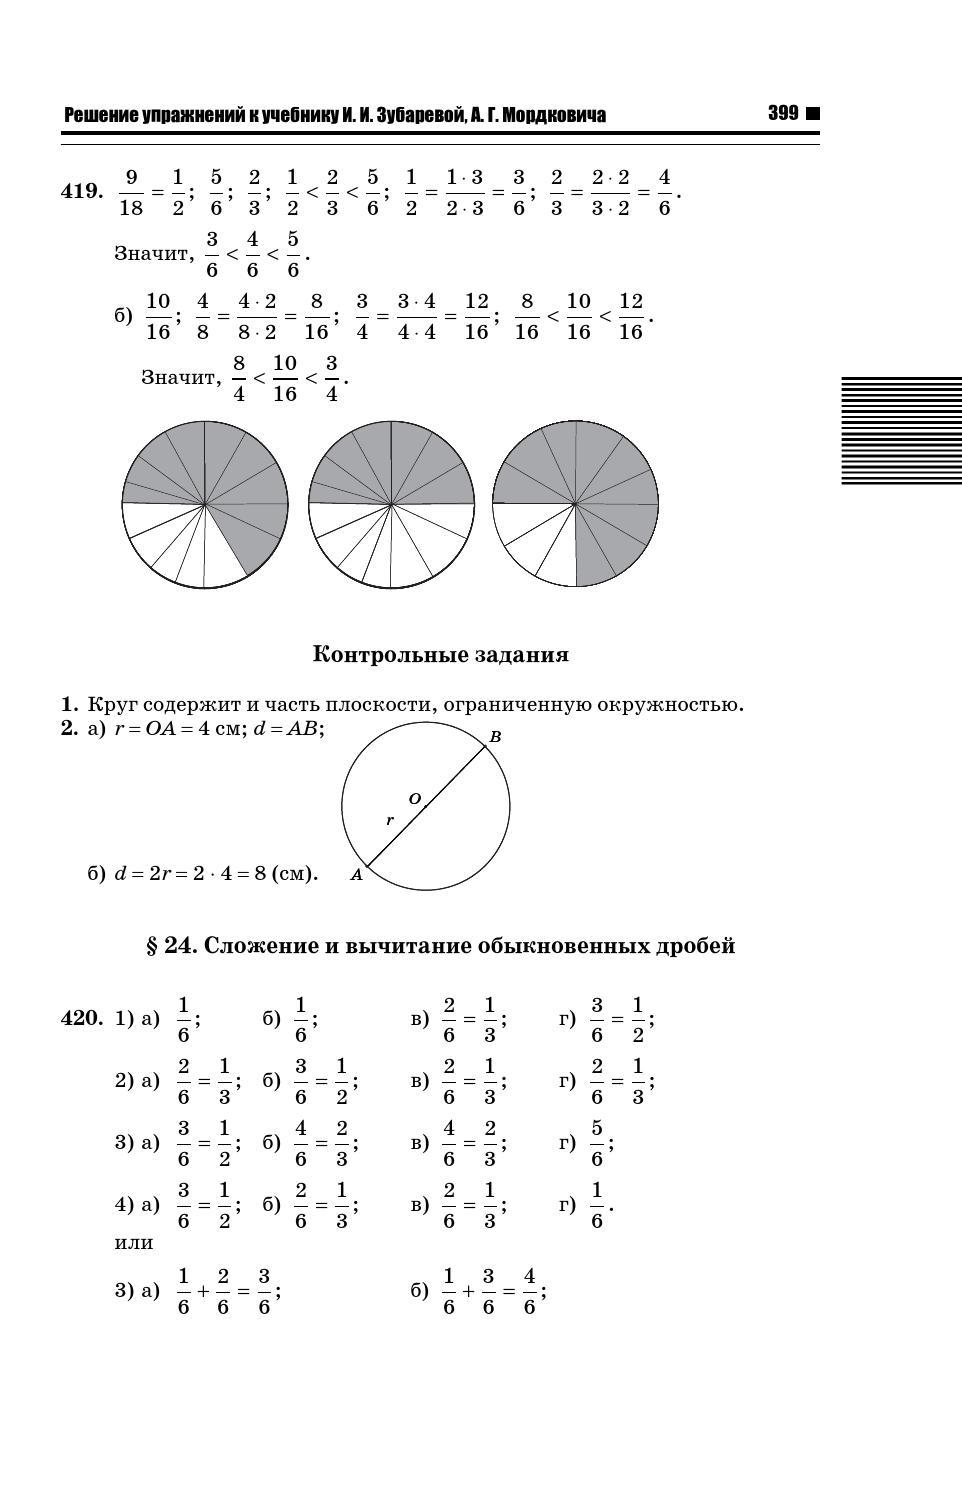 решебник к мордкович математика 5 класс скачать